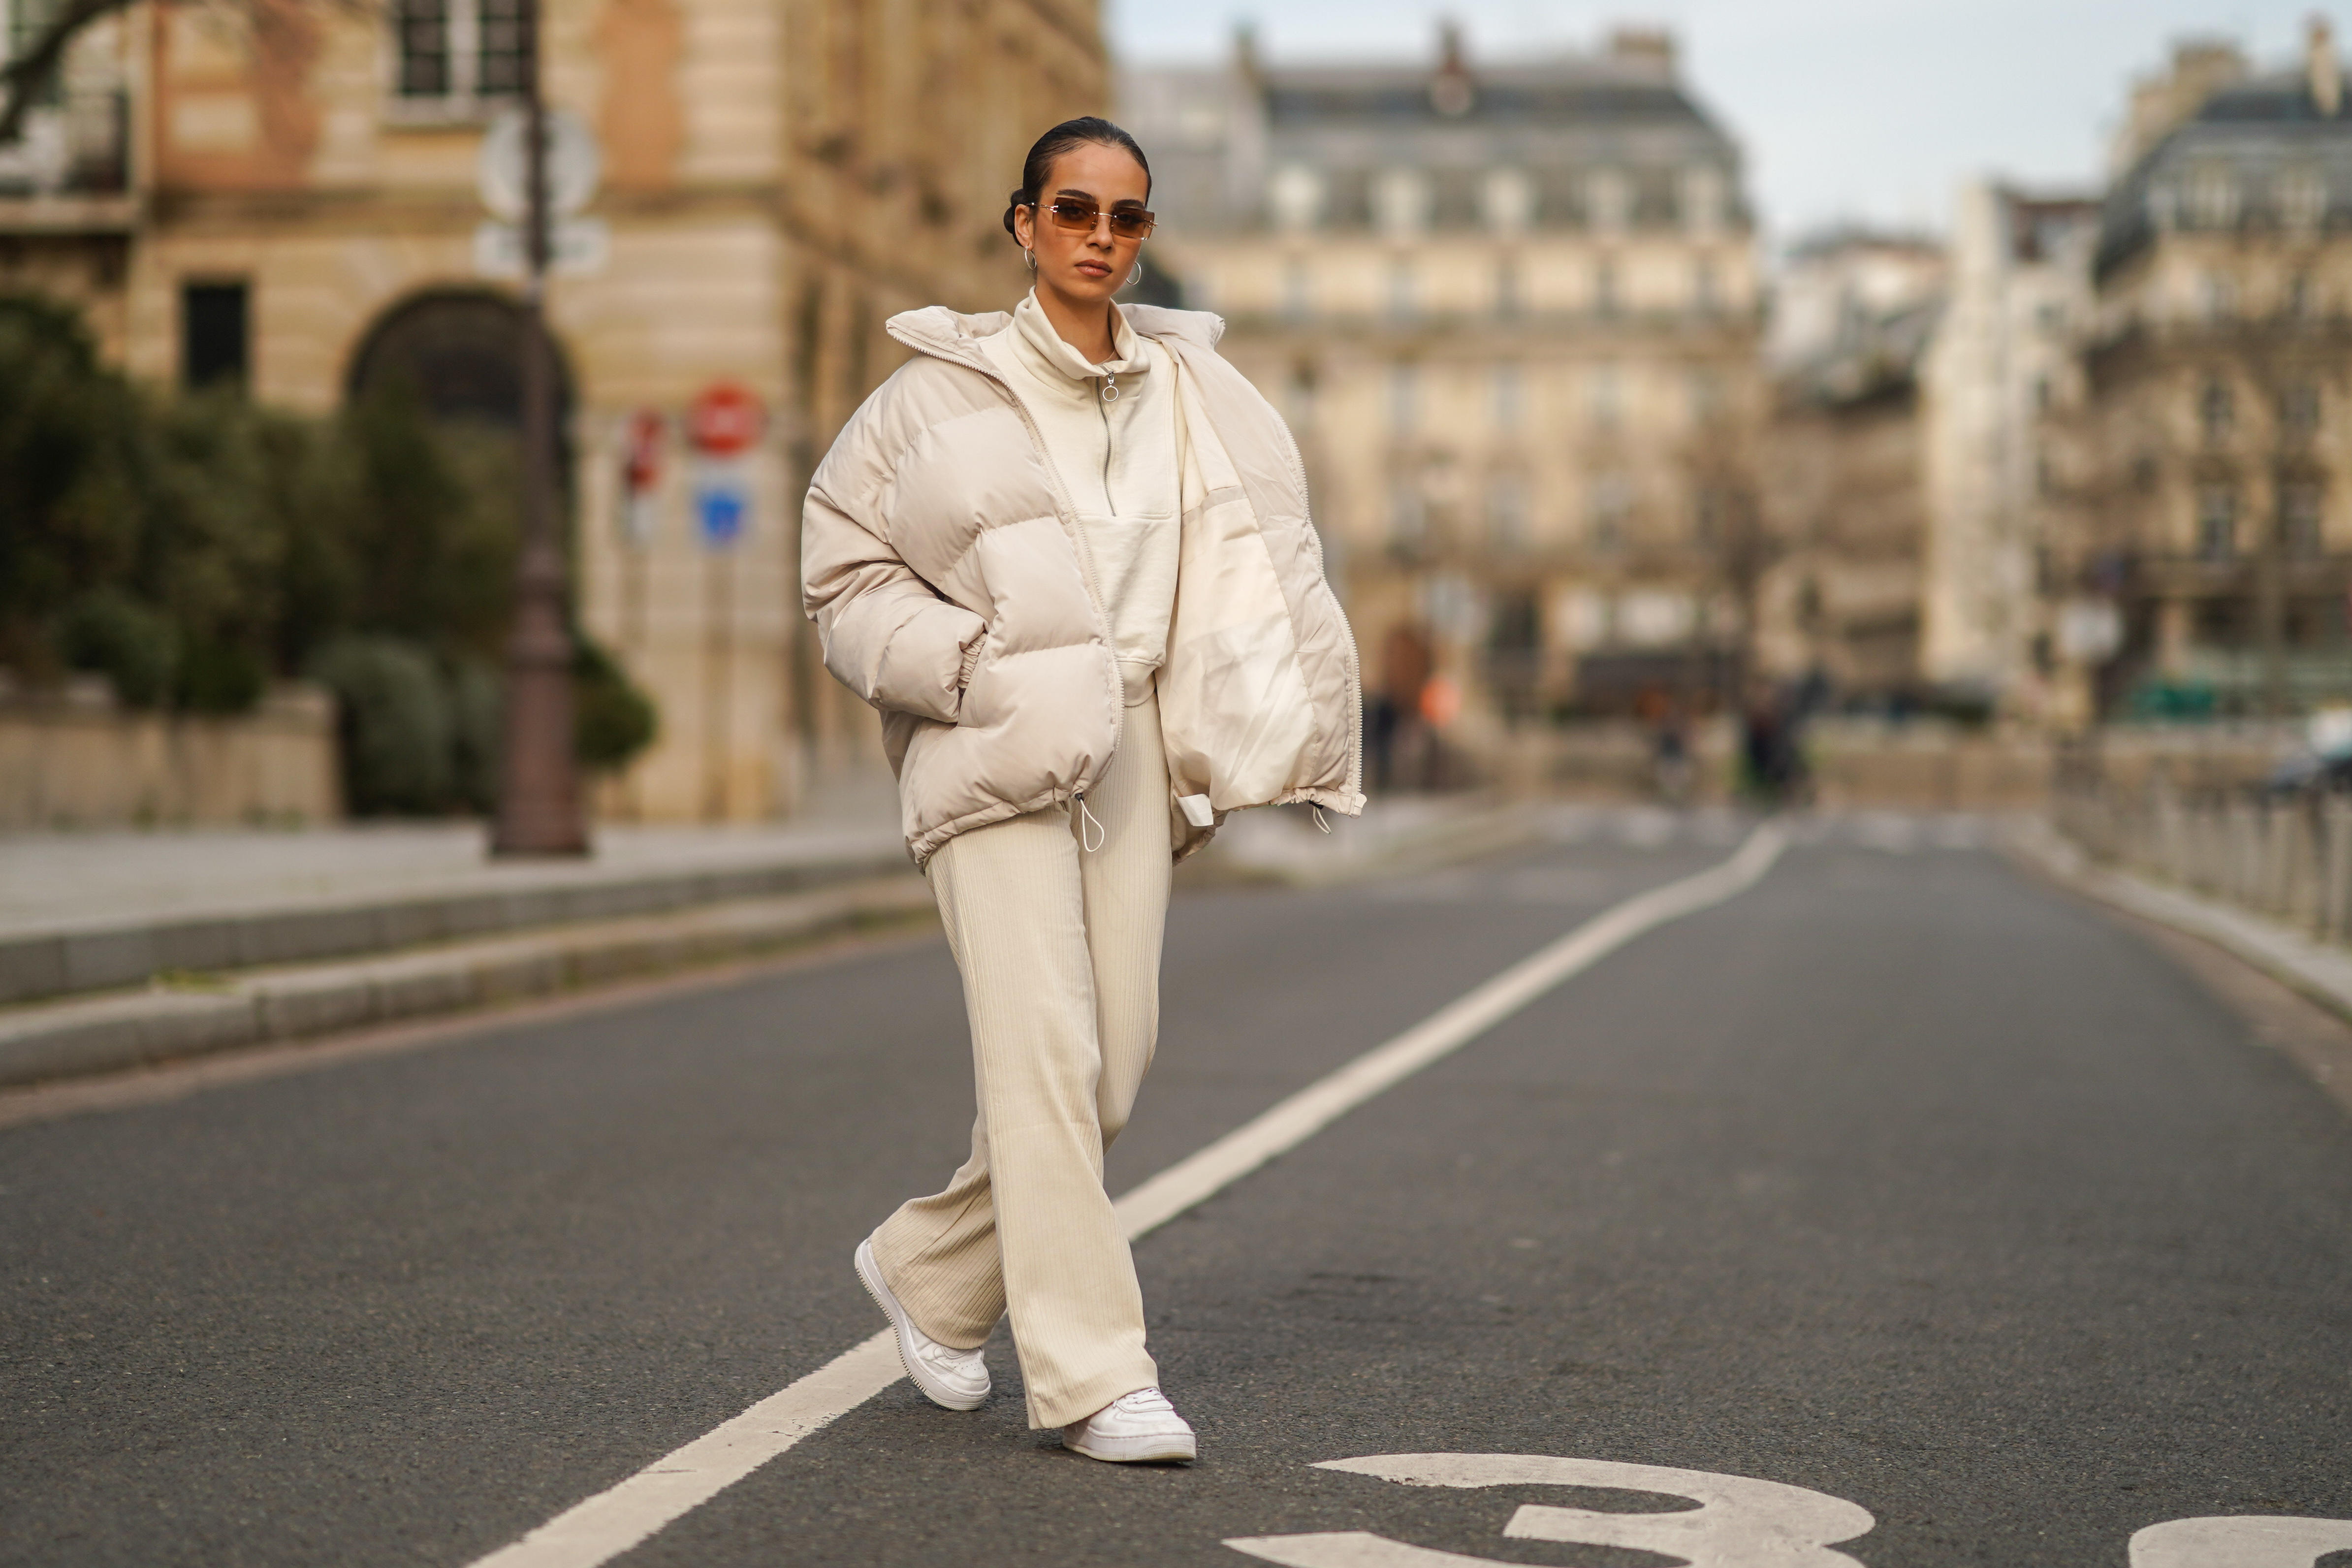 Fashion Photo Session In Paris - February 2021